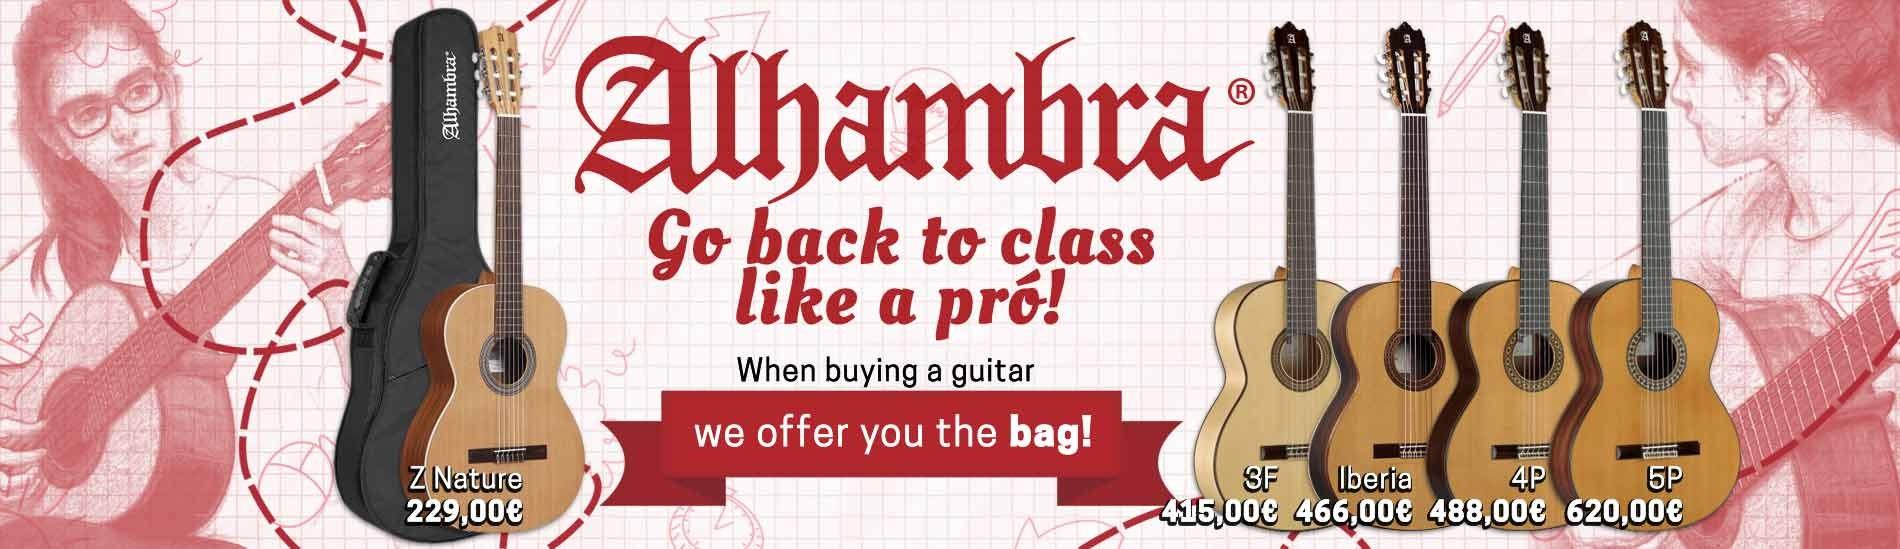 Alhambra - Go back to school like a pro!